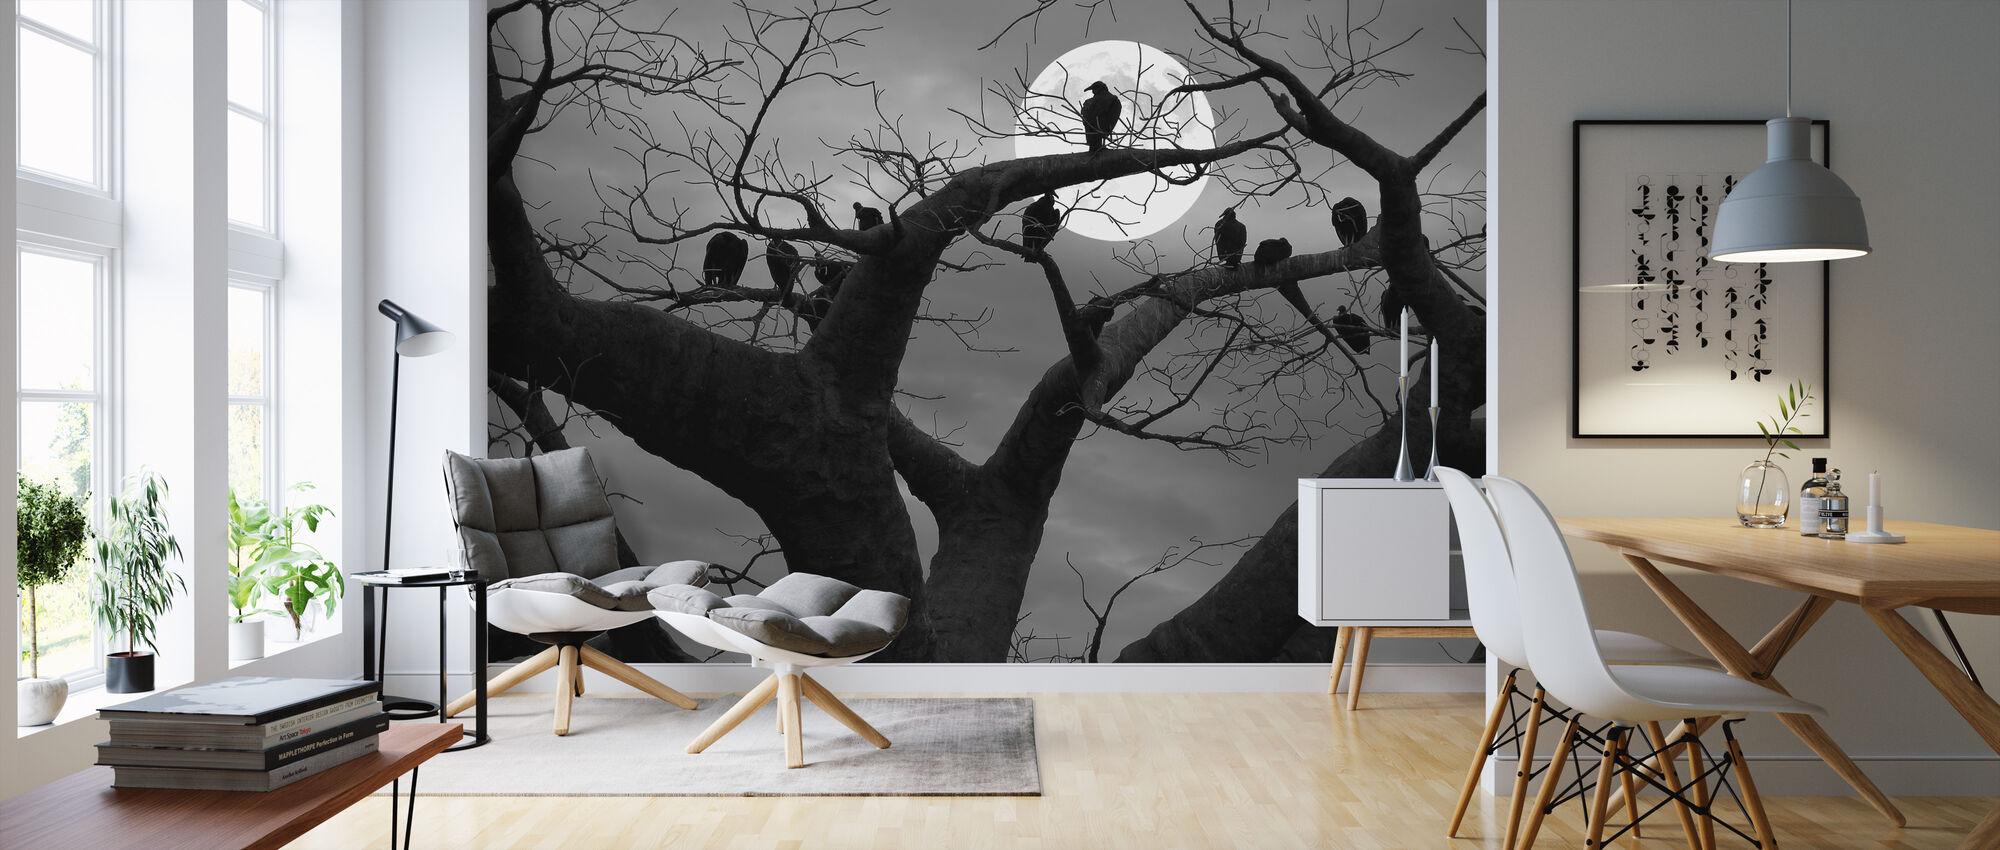 Spooky Tree - Wallpaper - Living Room